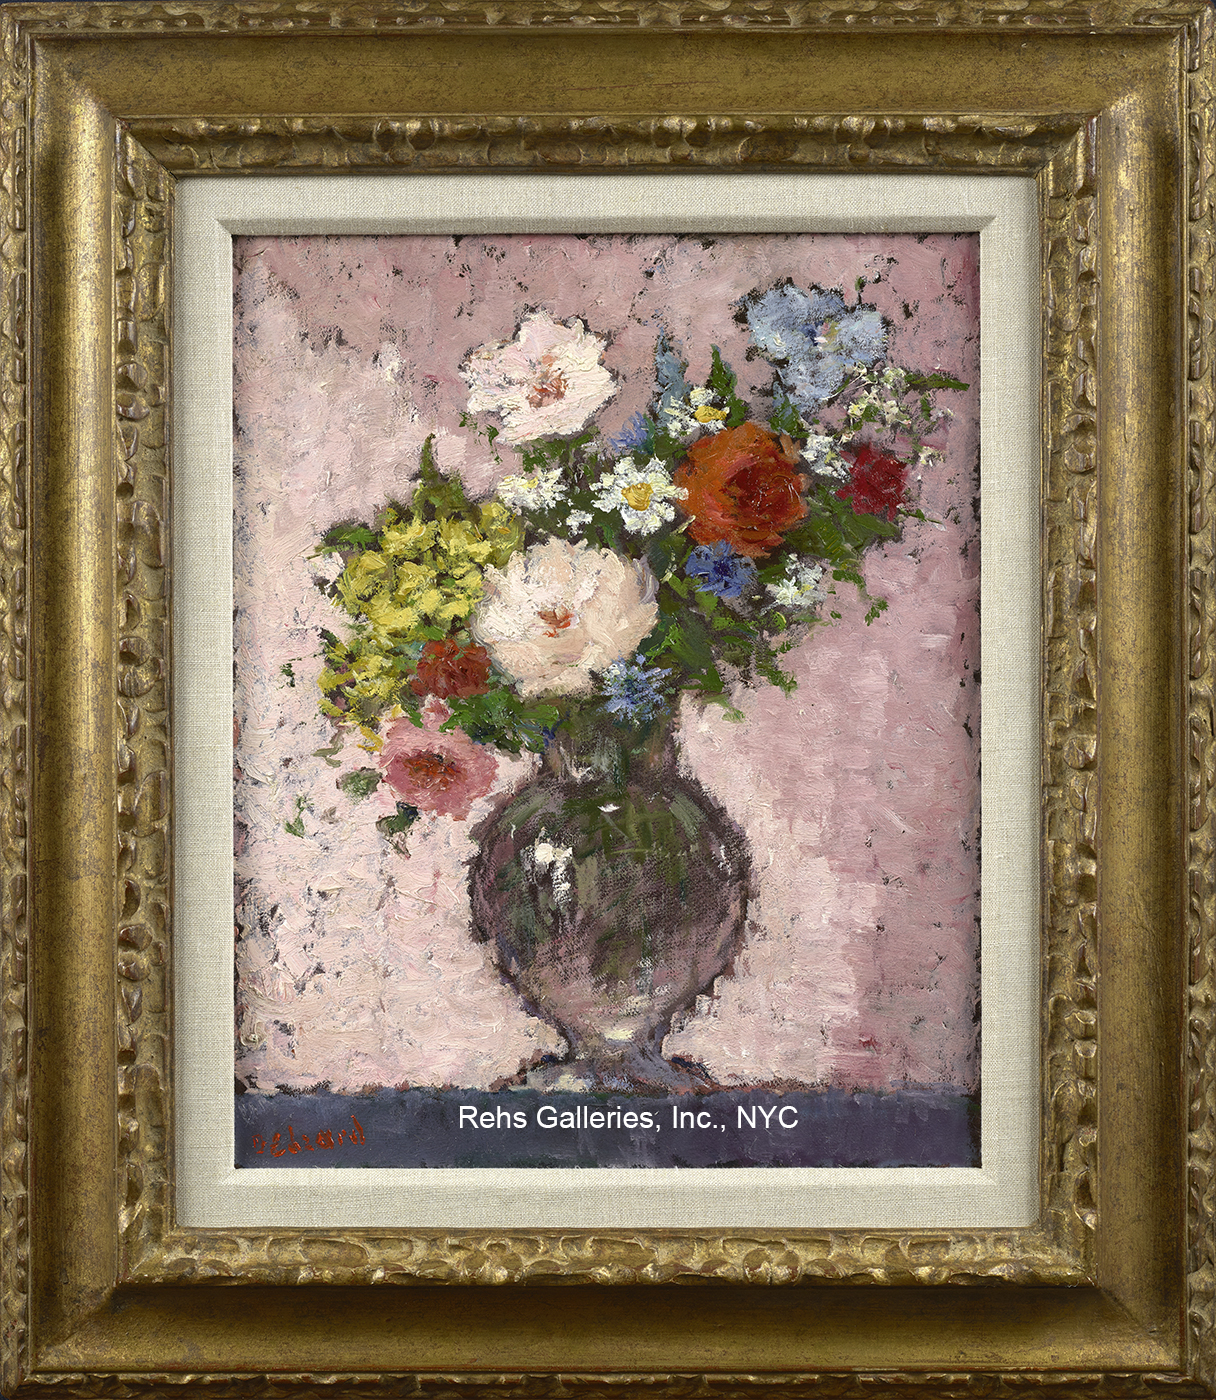 dietz_edzard_e1300_still_life_of_flowers_framed_wm.jpg